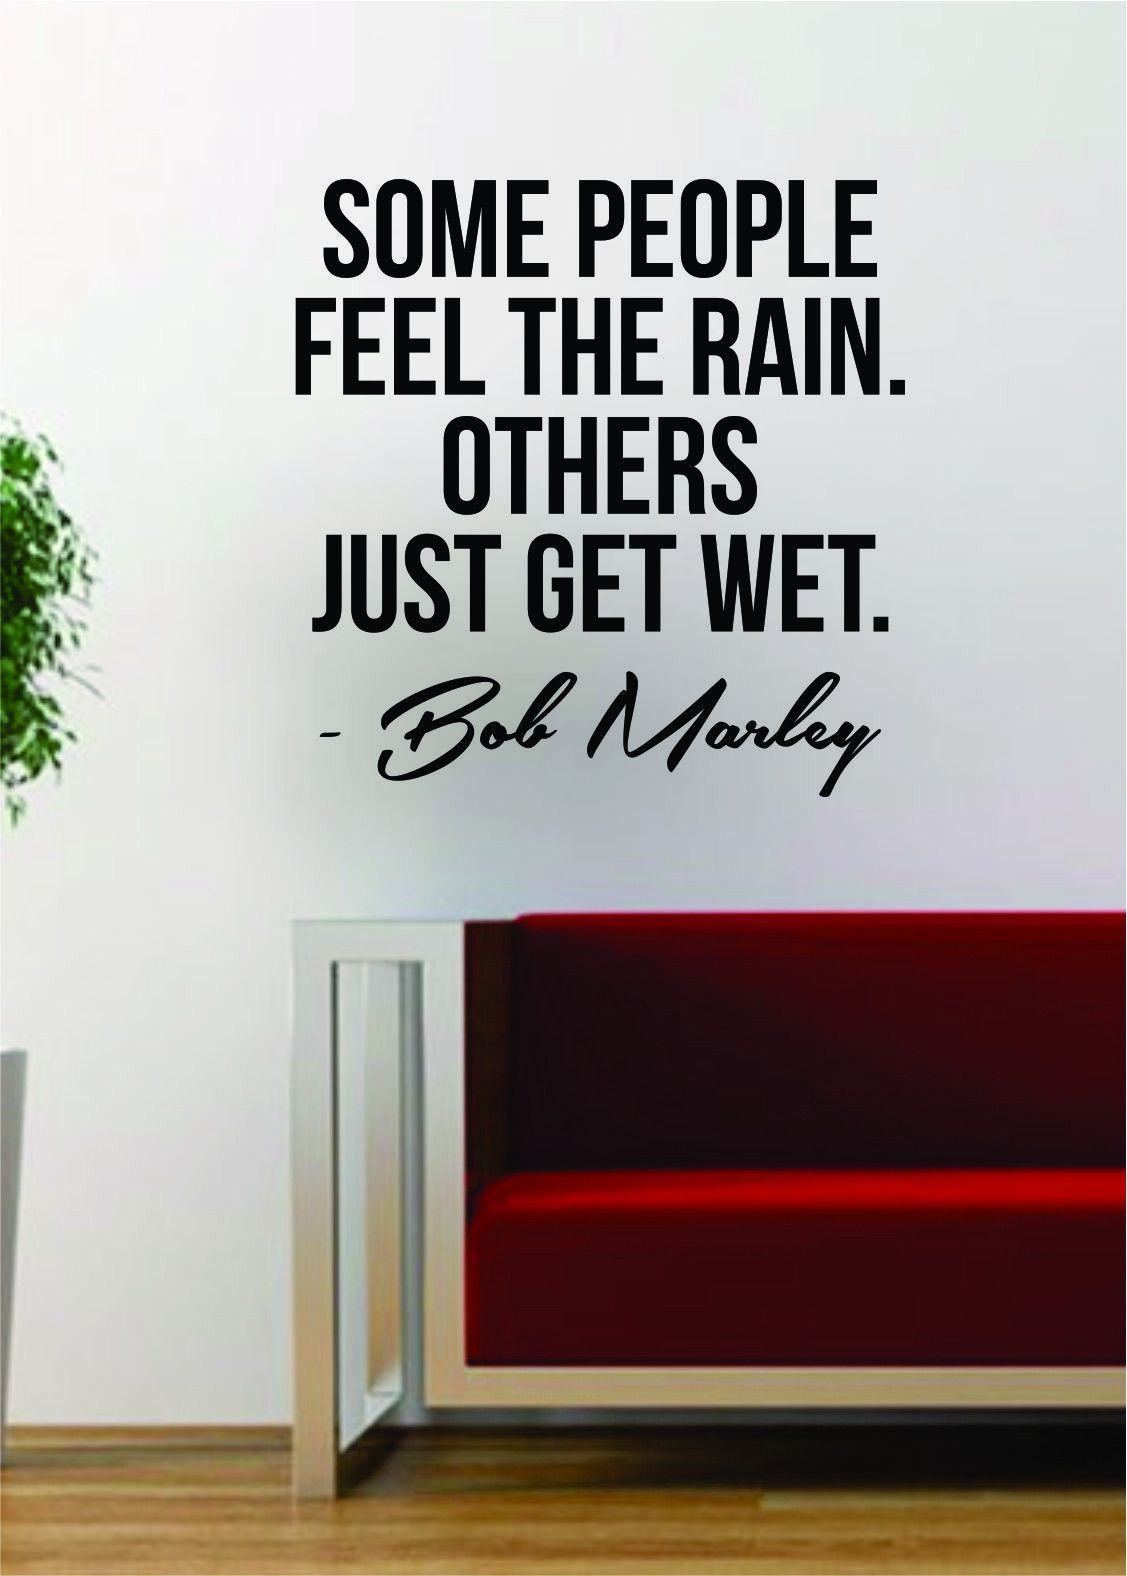 Bob marley some people feel the rain wall decal vinyl art sticker bob marley some people feel the rain wall decal vinyl art sticker music reggae lyrics inspirational amipublicfo Images